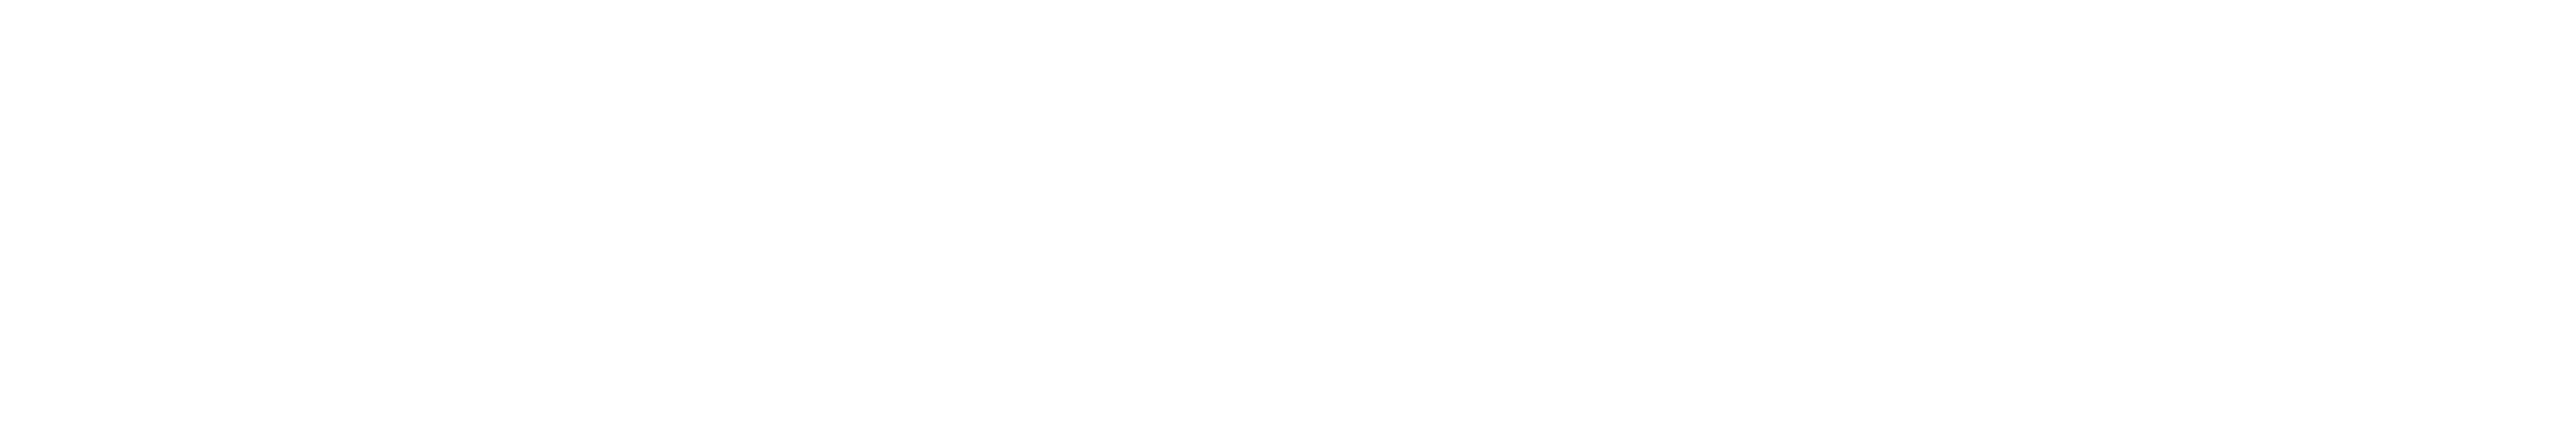 workbyw-zapbeauty-logo-02